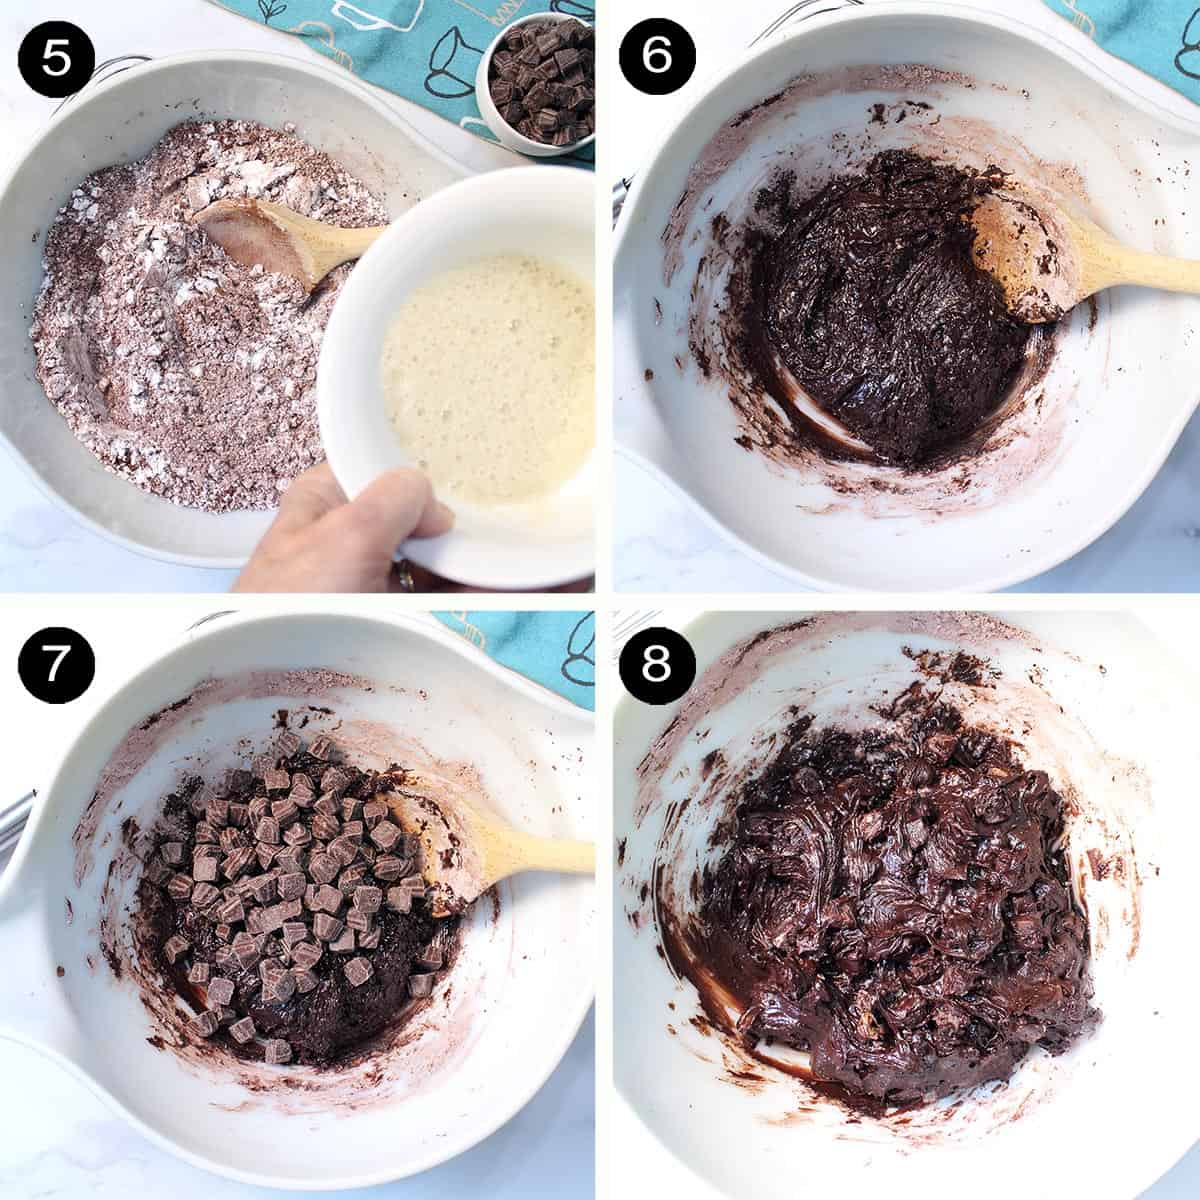 Last 4 prep steps for chocolate cookies.